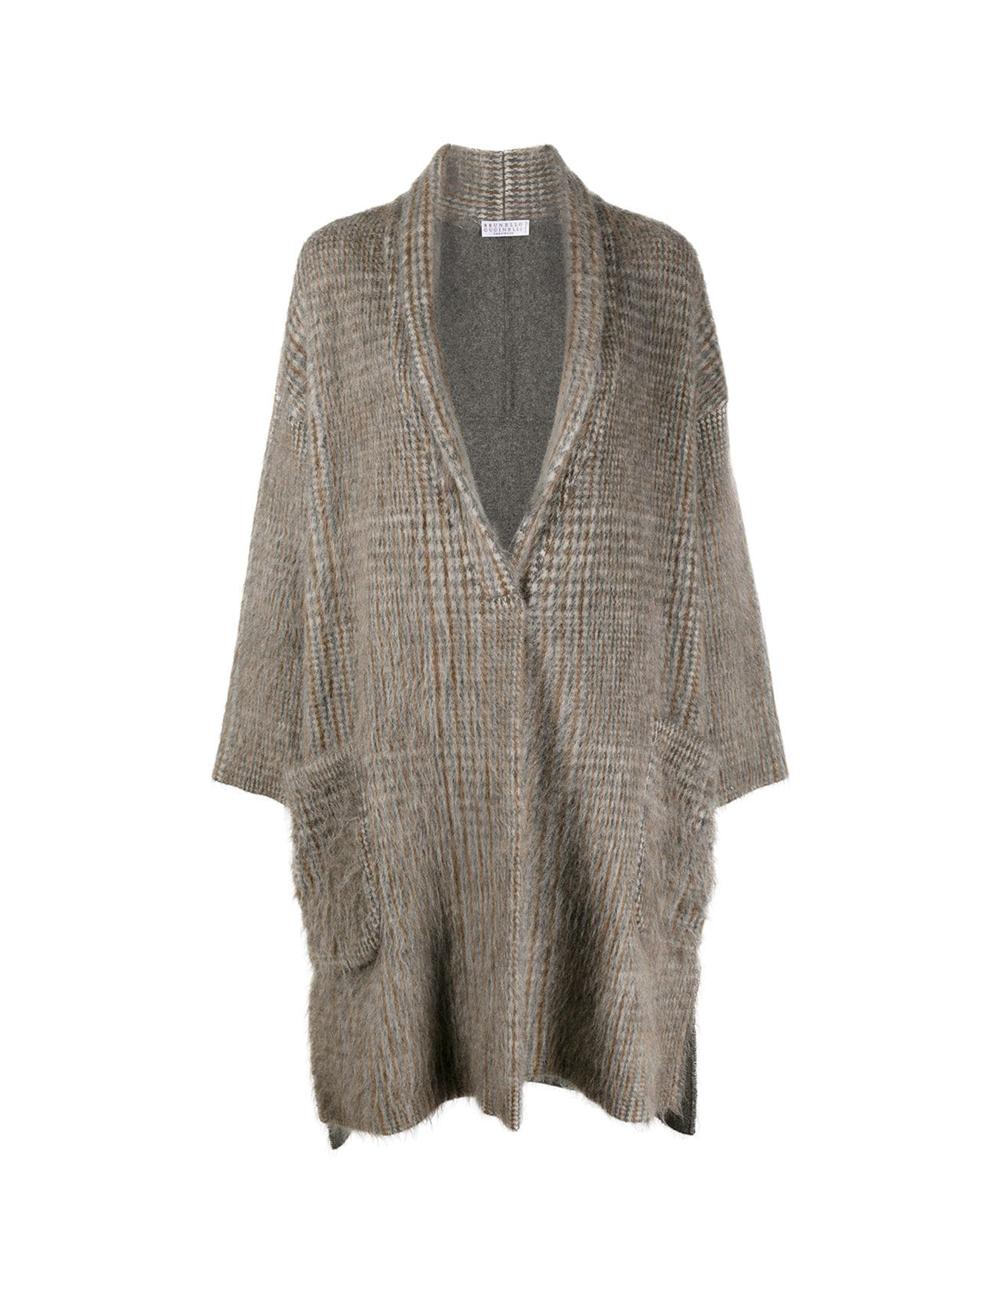 Manteau oversize motif écossais Brunello Cucinelli - BIG BOSS MEGEVE